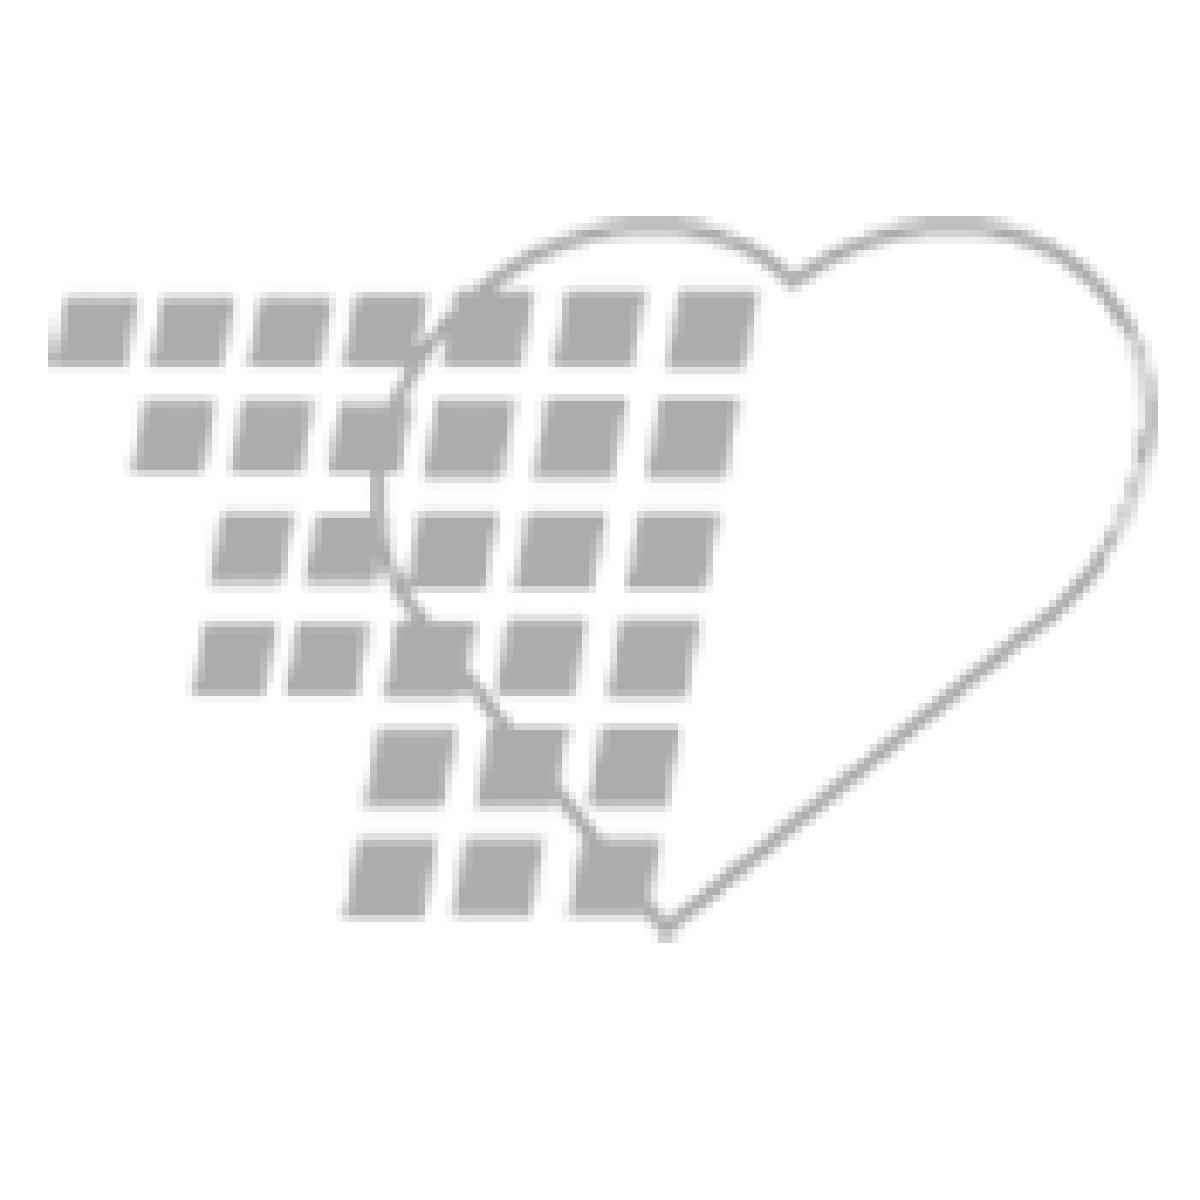 08-82-4521 - Suture Removal Kit (Sterile)